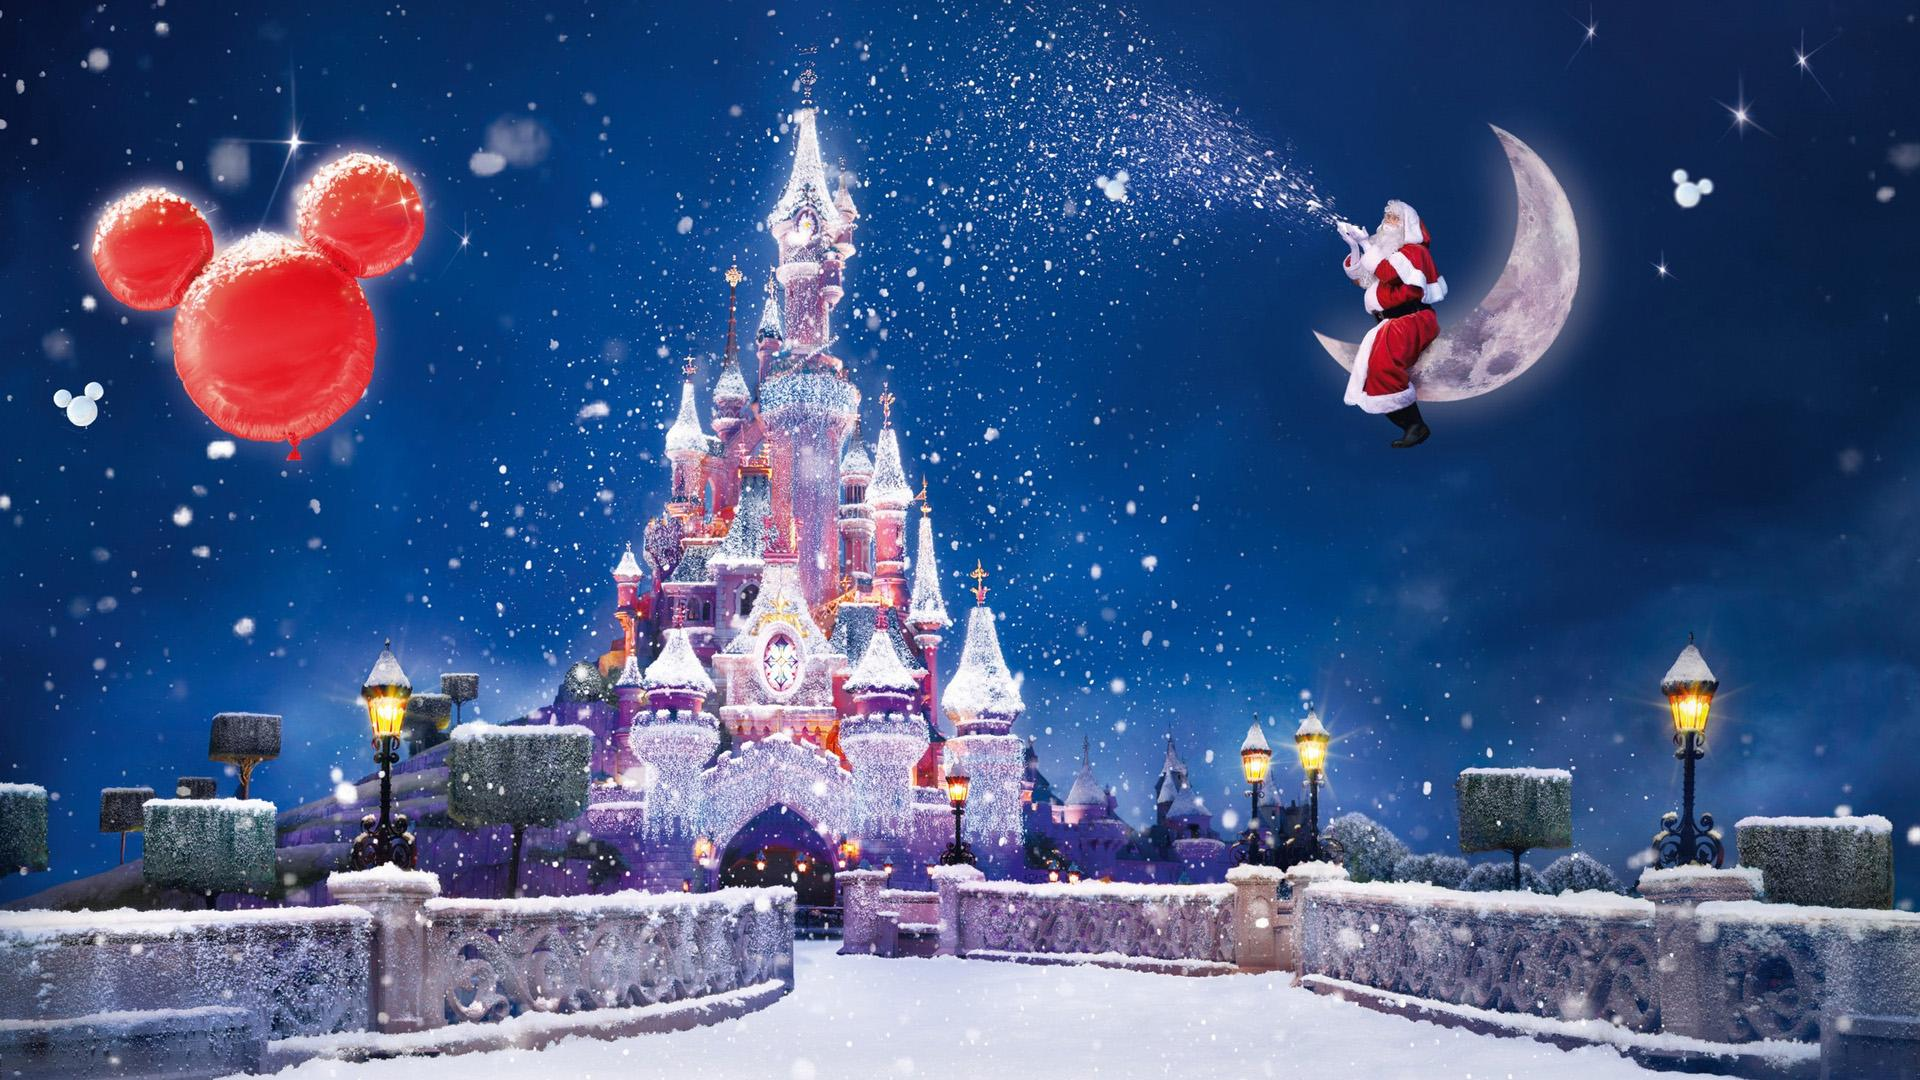 Christmas-Wallpaper-ADF-free-hd